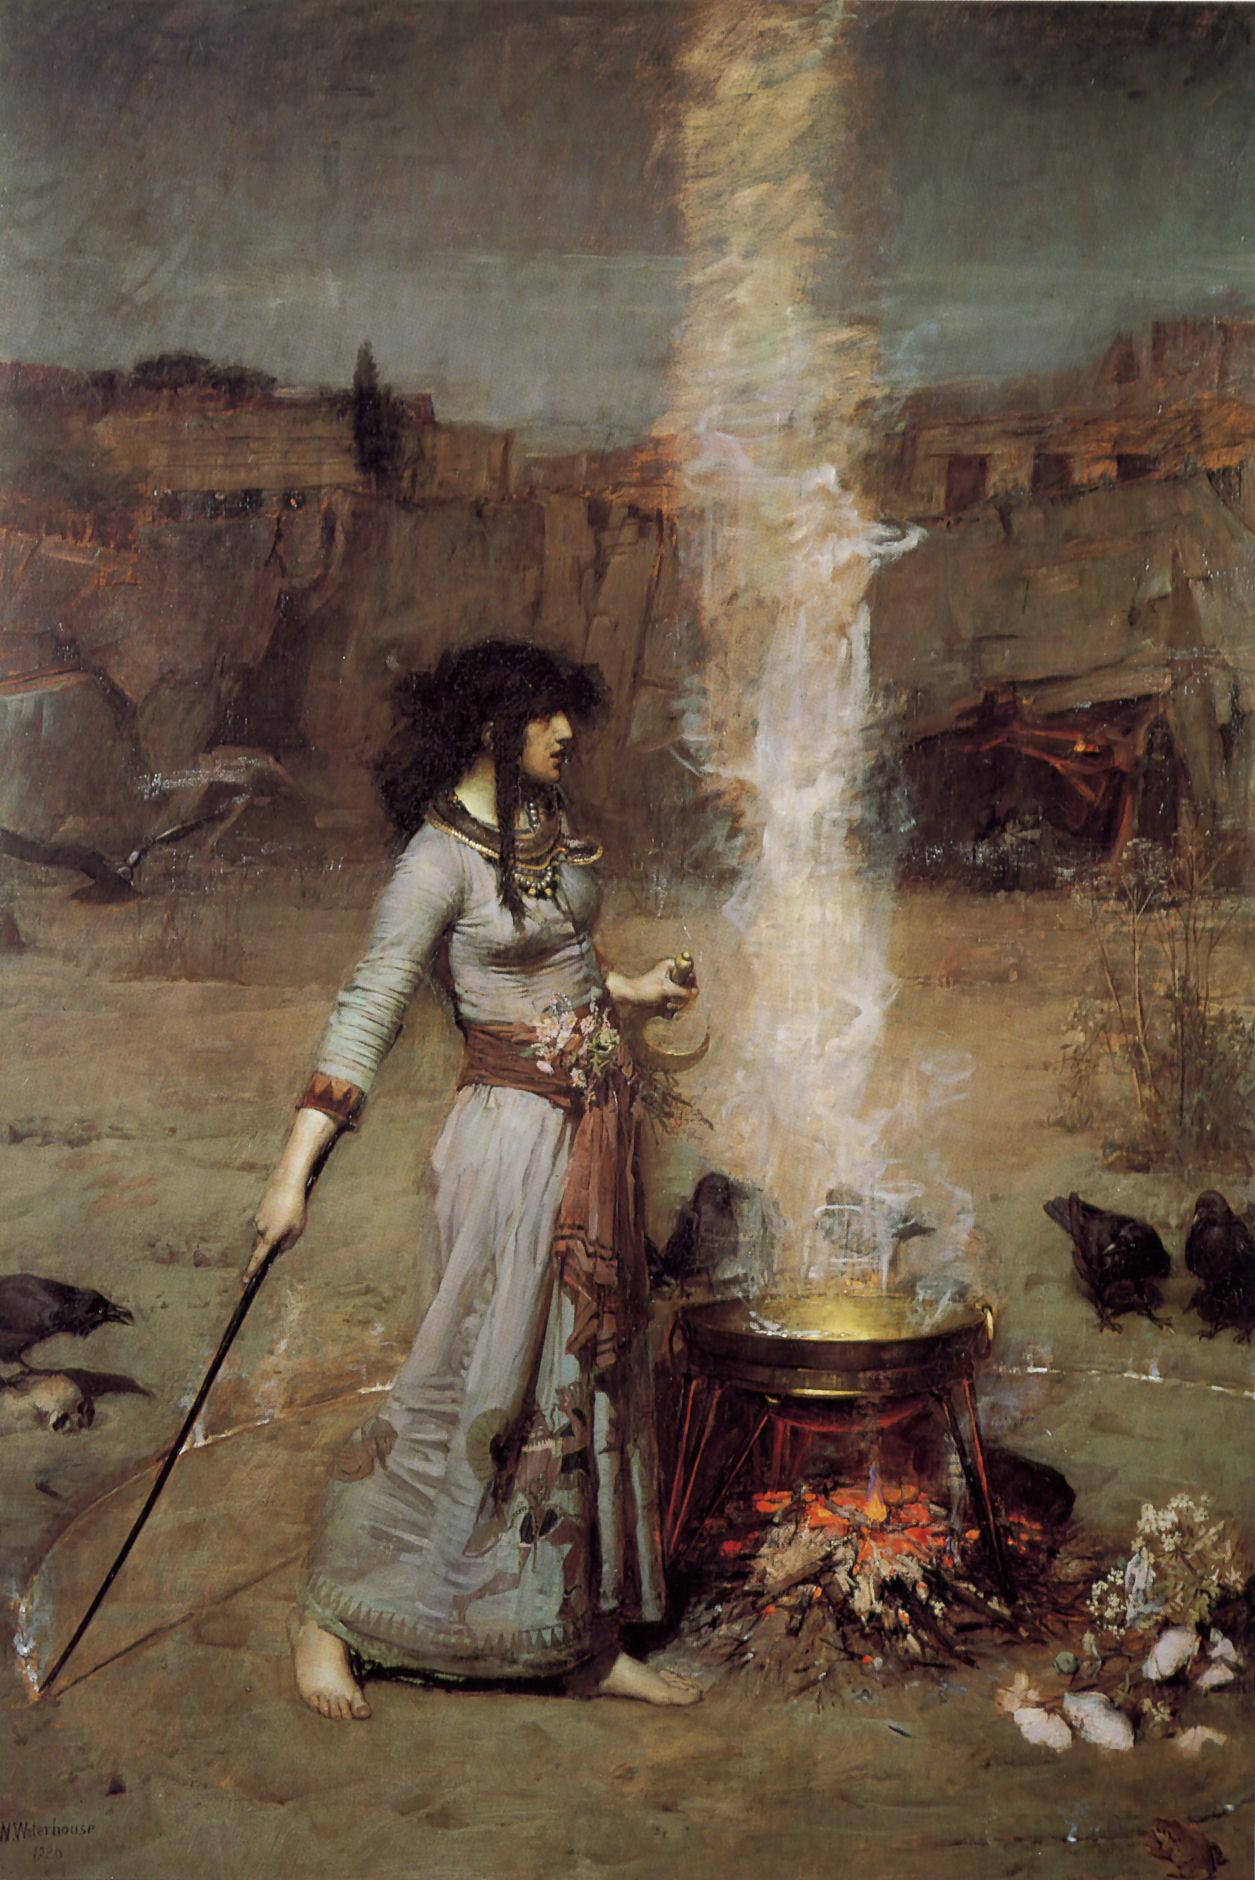 The Magic Circle by John W. Waterhouse